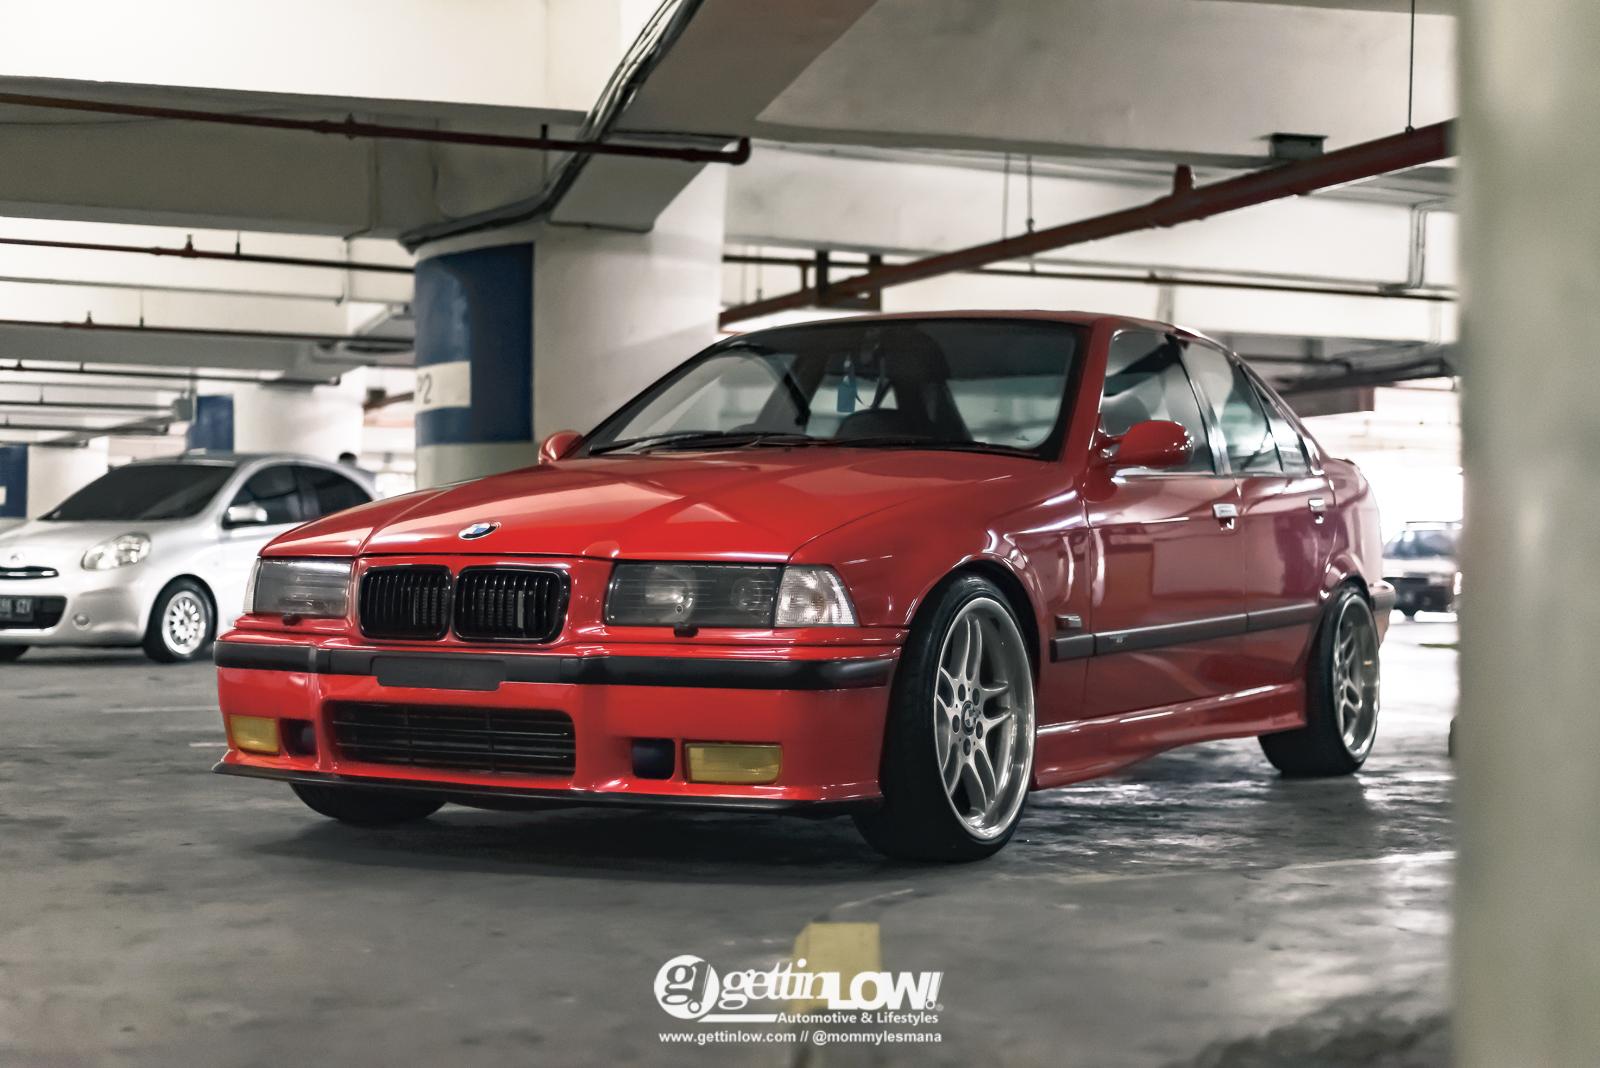 LFD17-BMW-E36-RED-4